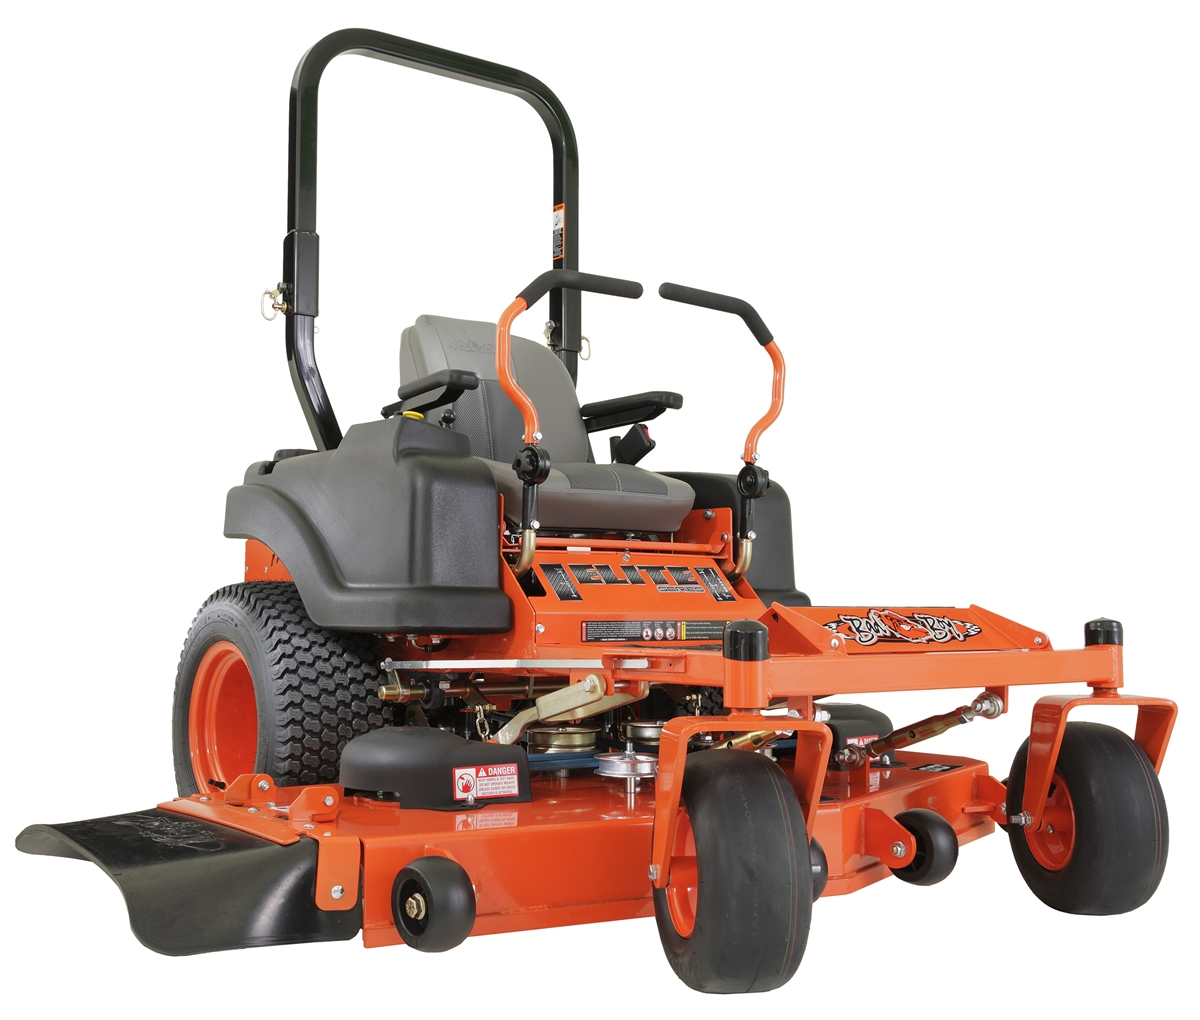 hydro gear zt 5400 manual